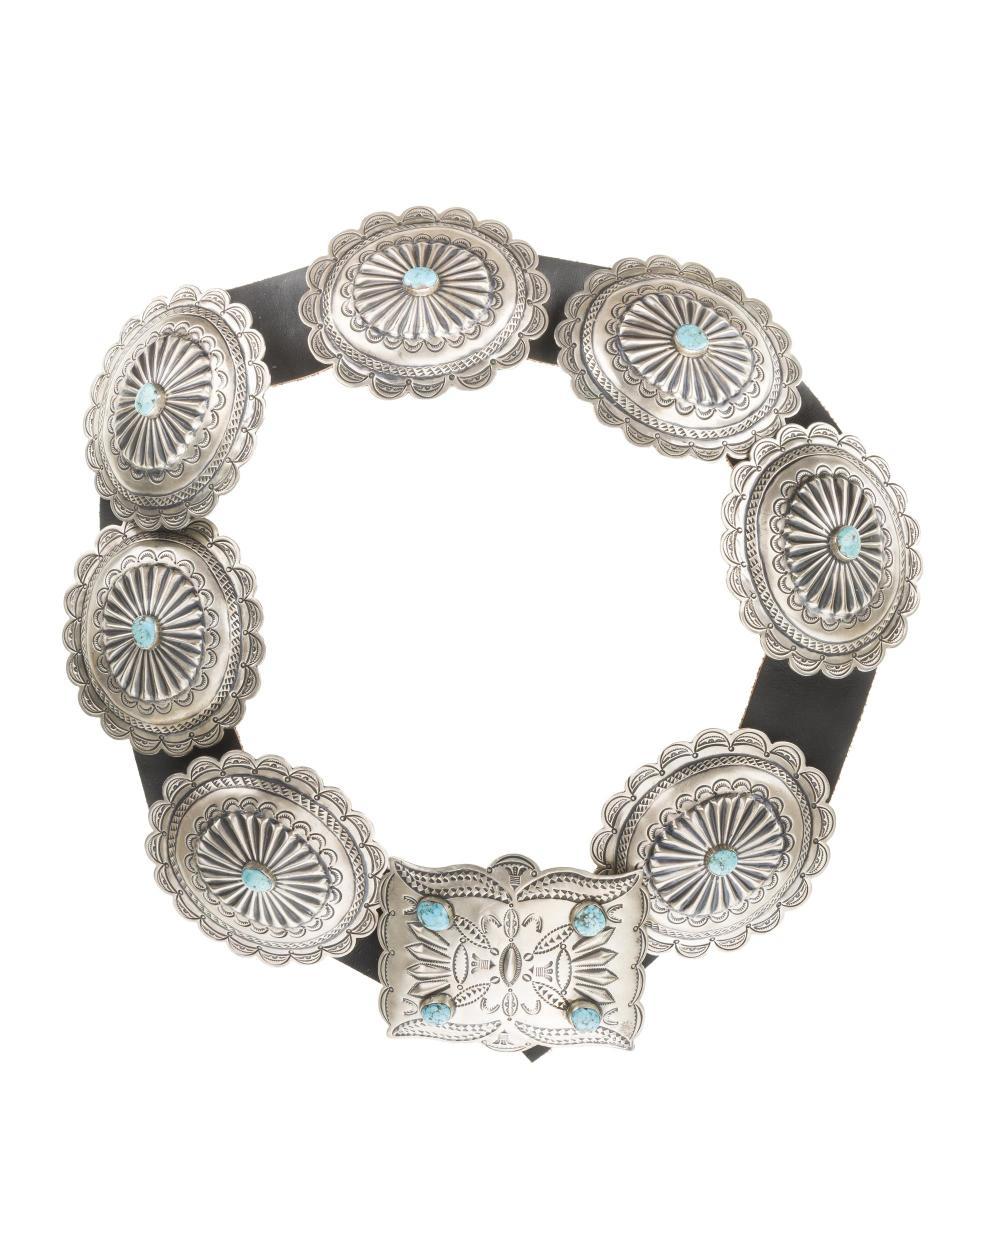 A Navajo silver concho belt